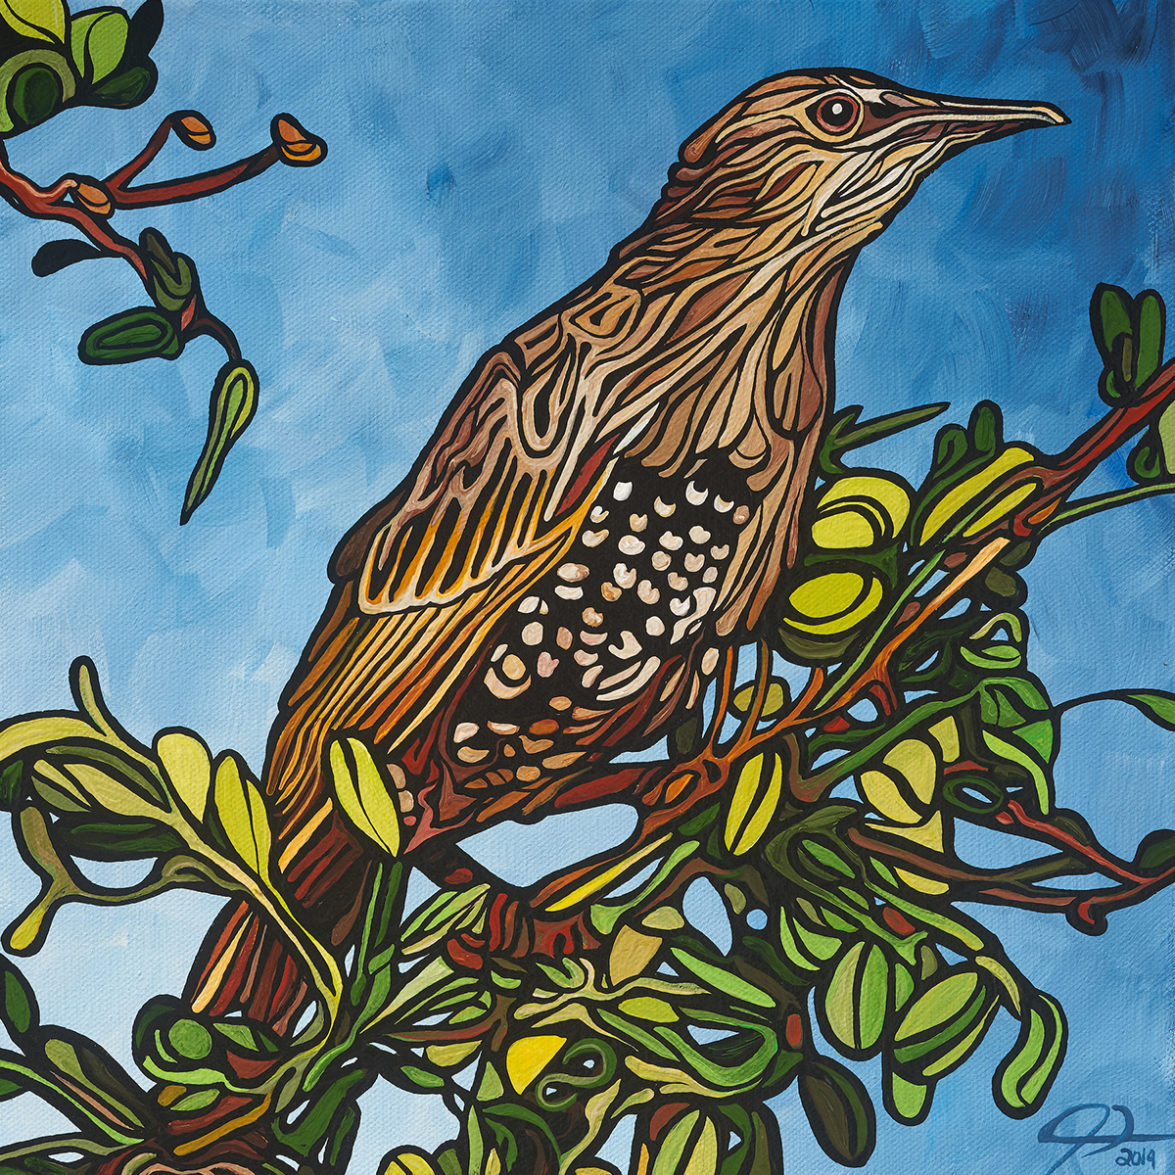 166 Starling p